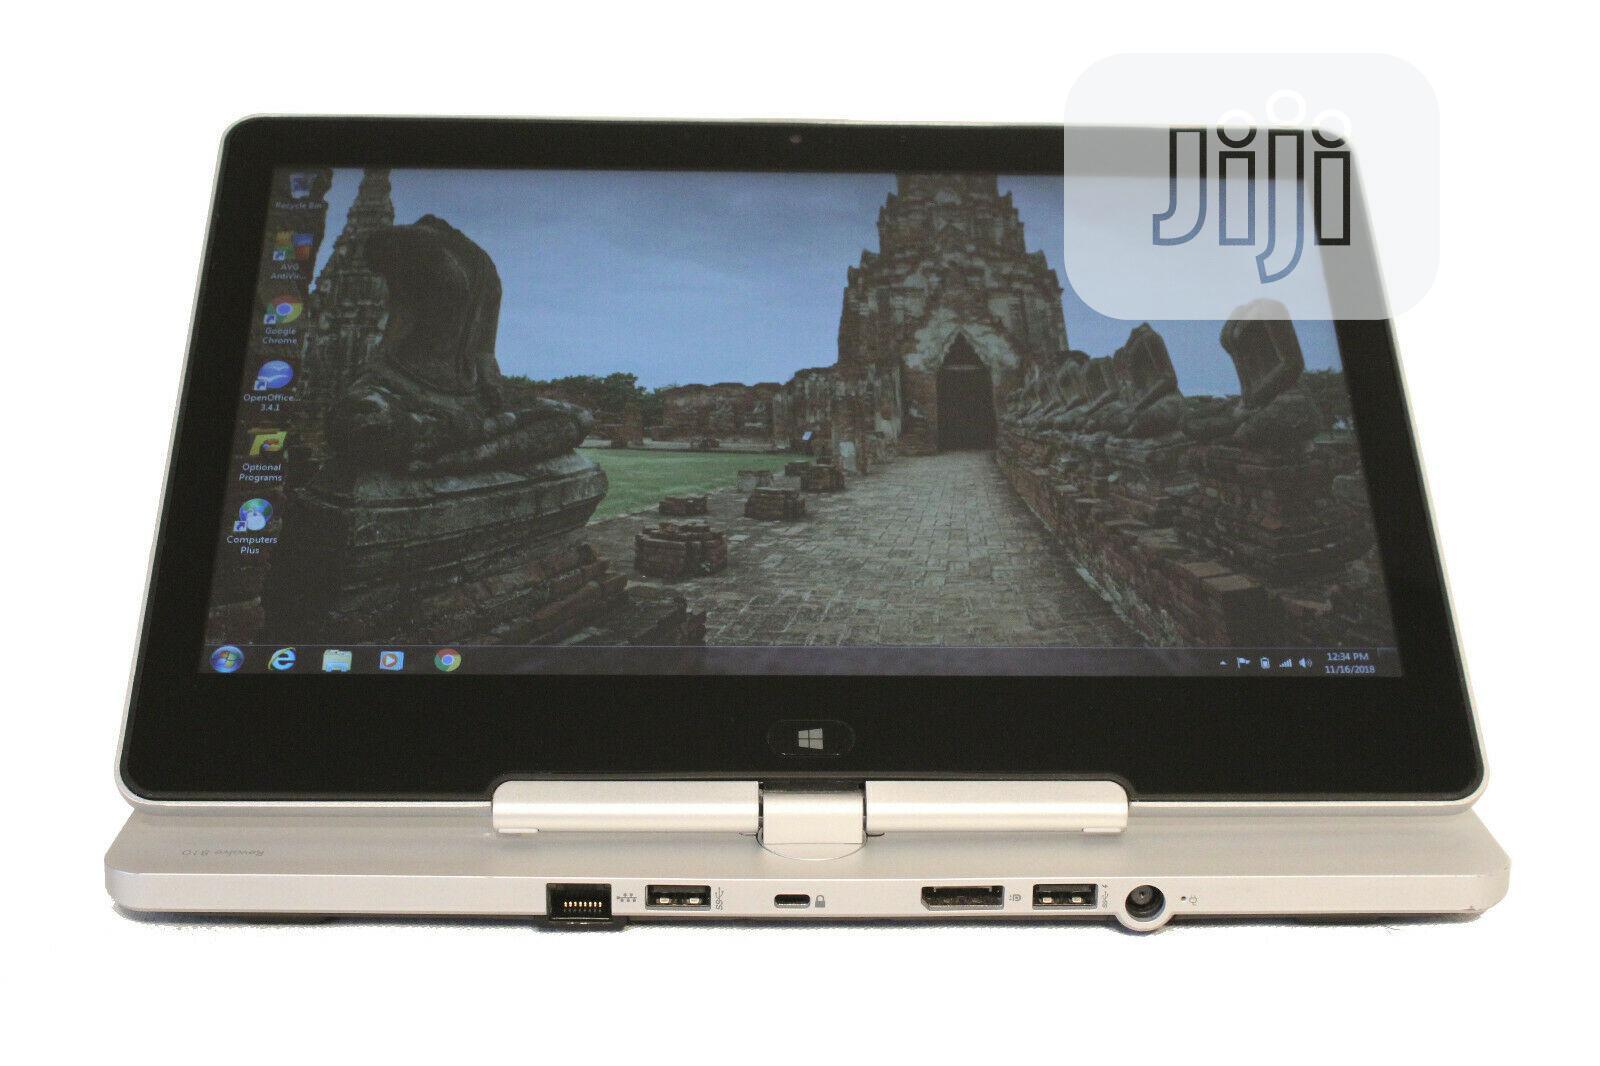 Laptop HP EliteBook Revolve 810 G1 4GB Intel Core I5 SSD 256GB | Laptops & Computers for sale in Bwari, Abuja (FCT) State, Nigeria